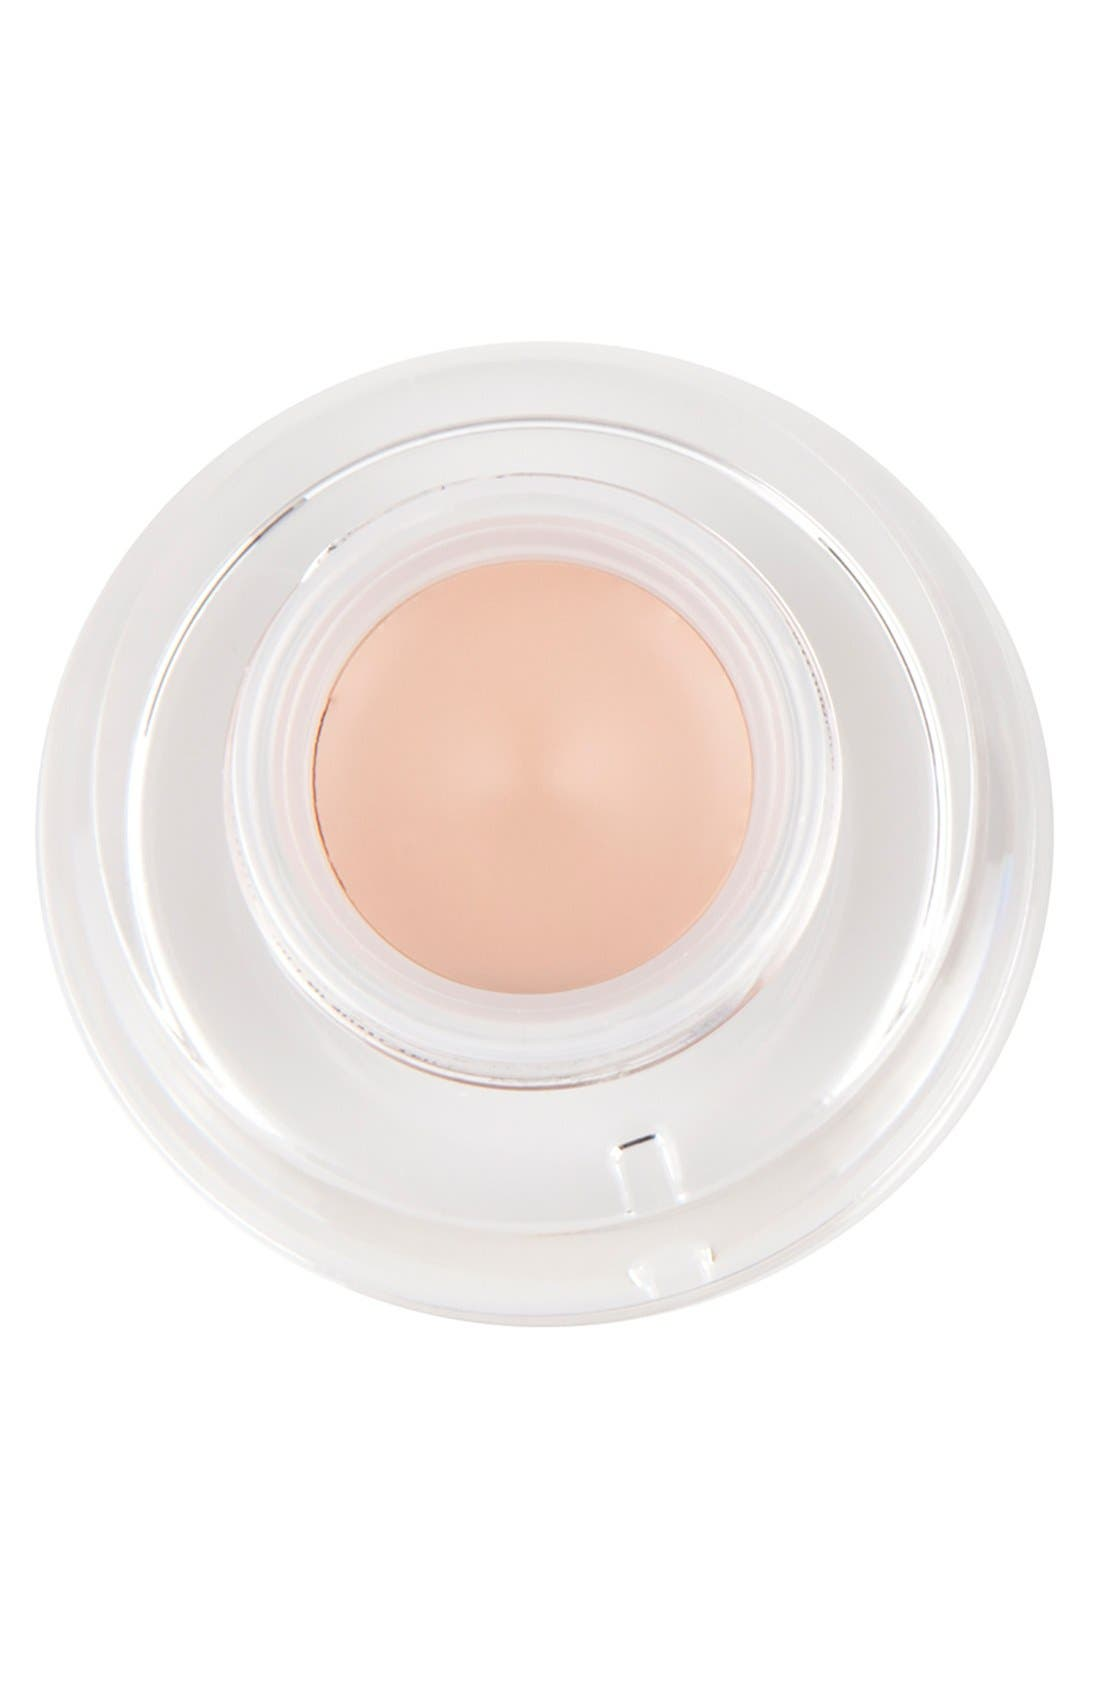 Eyeshadow Base,                         Main,                         color, 250